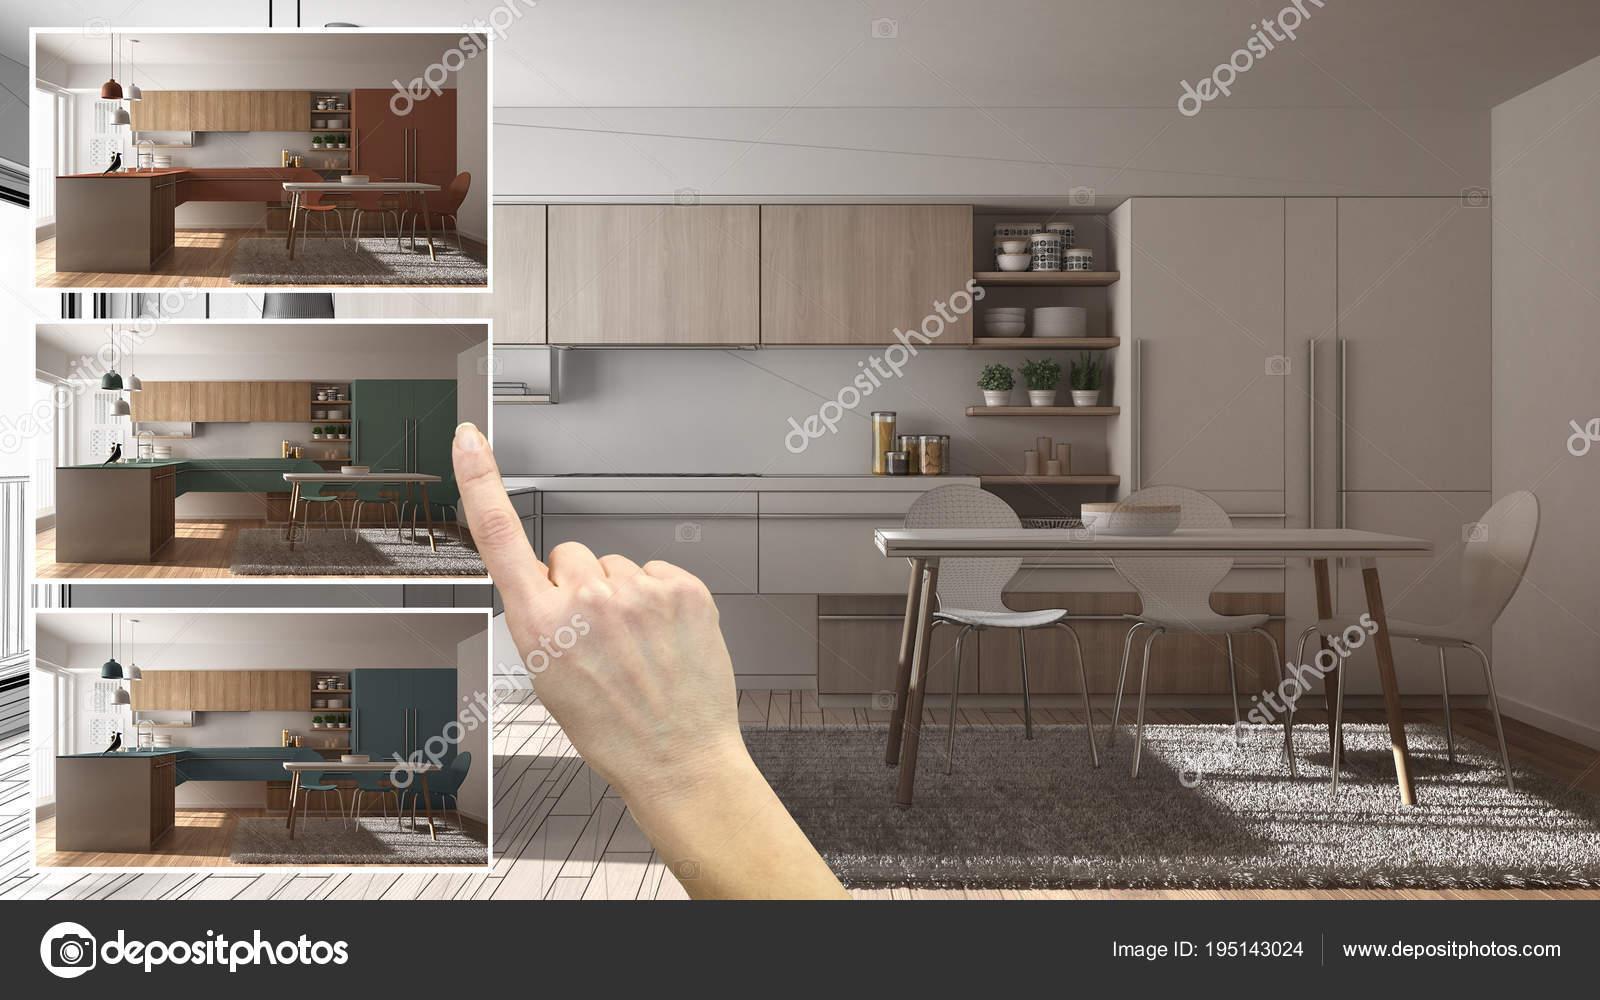 kitchen samples angled cabinets 建筑师设计师概念 手展示厨房颜色不同的选择 室内设计项目草稿 拾色器 材料样品 照片作者archiviz